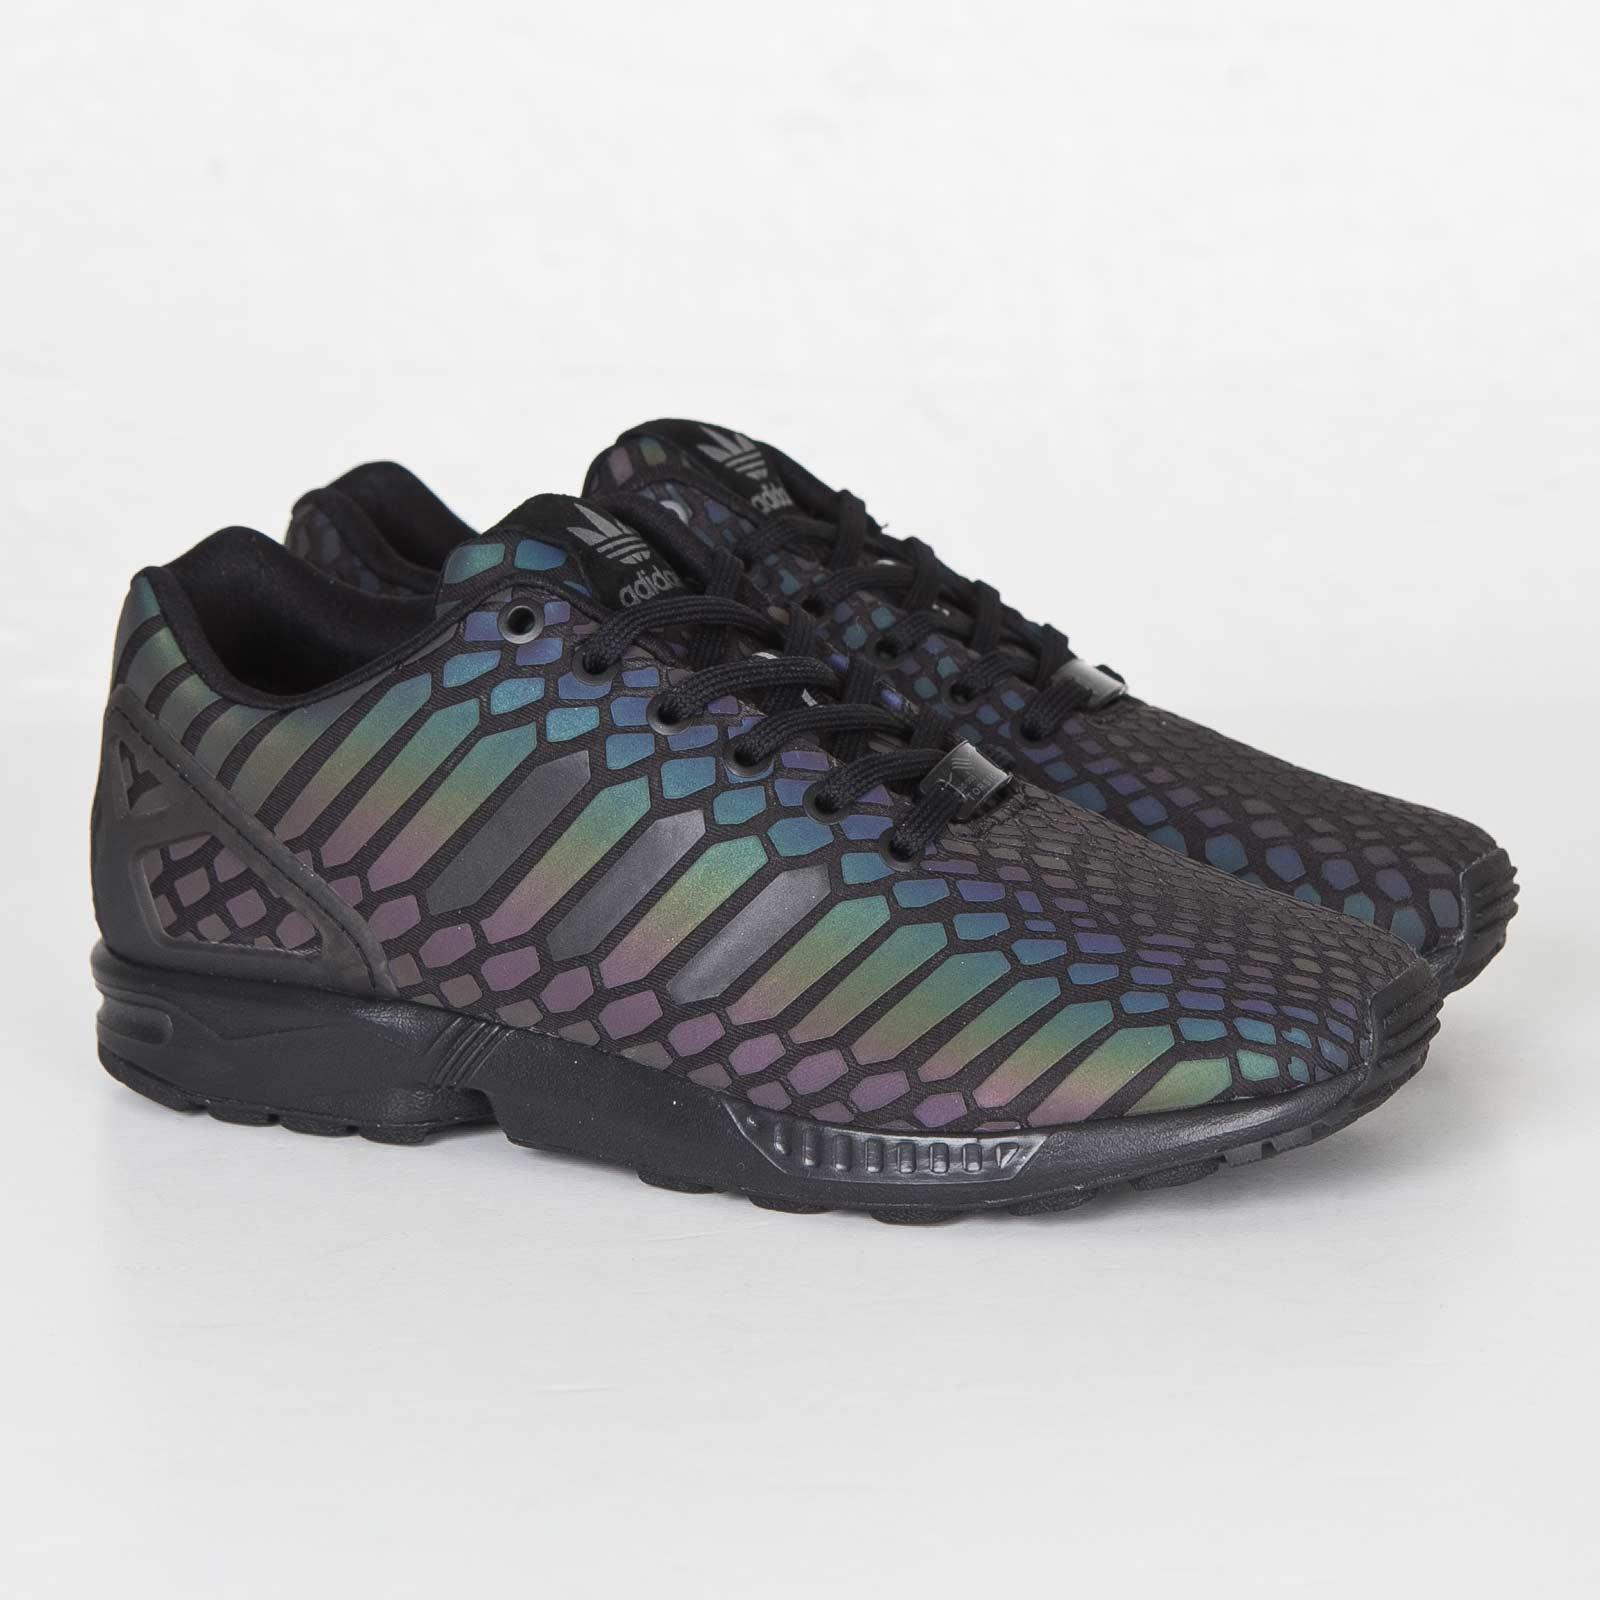 b023dc65917e7 adidas Zx Flux Xeno - Aq7418 - Sneakersnstuff